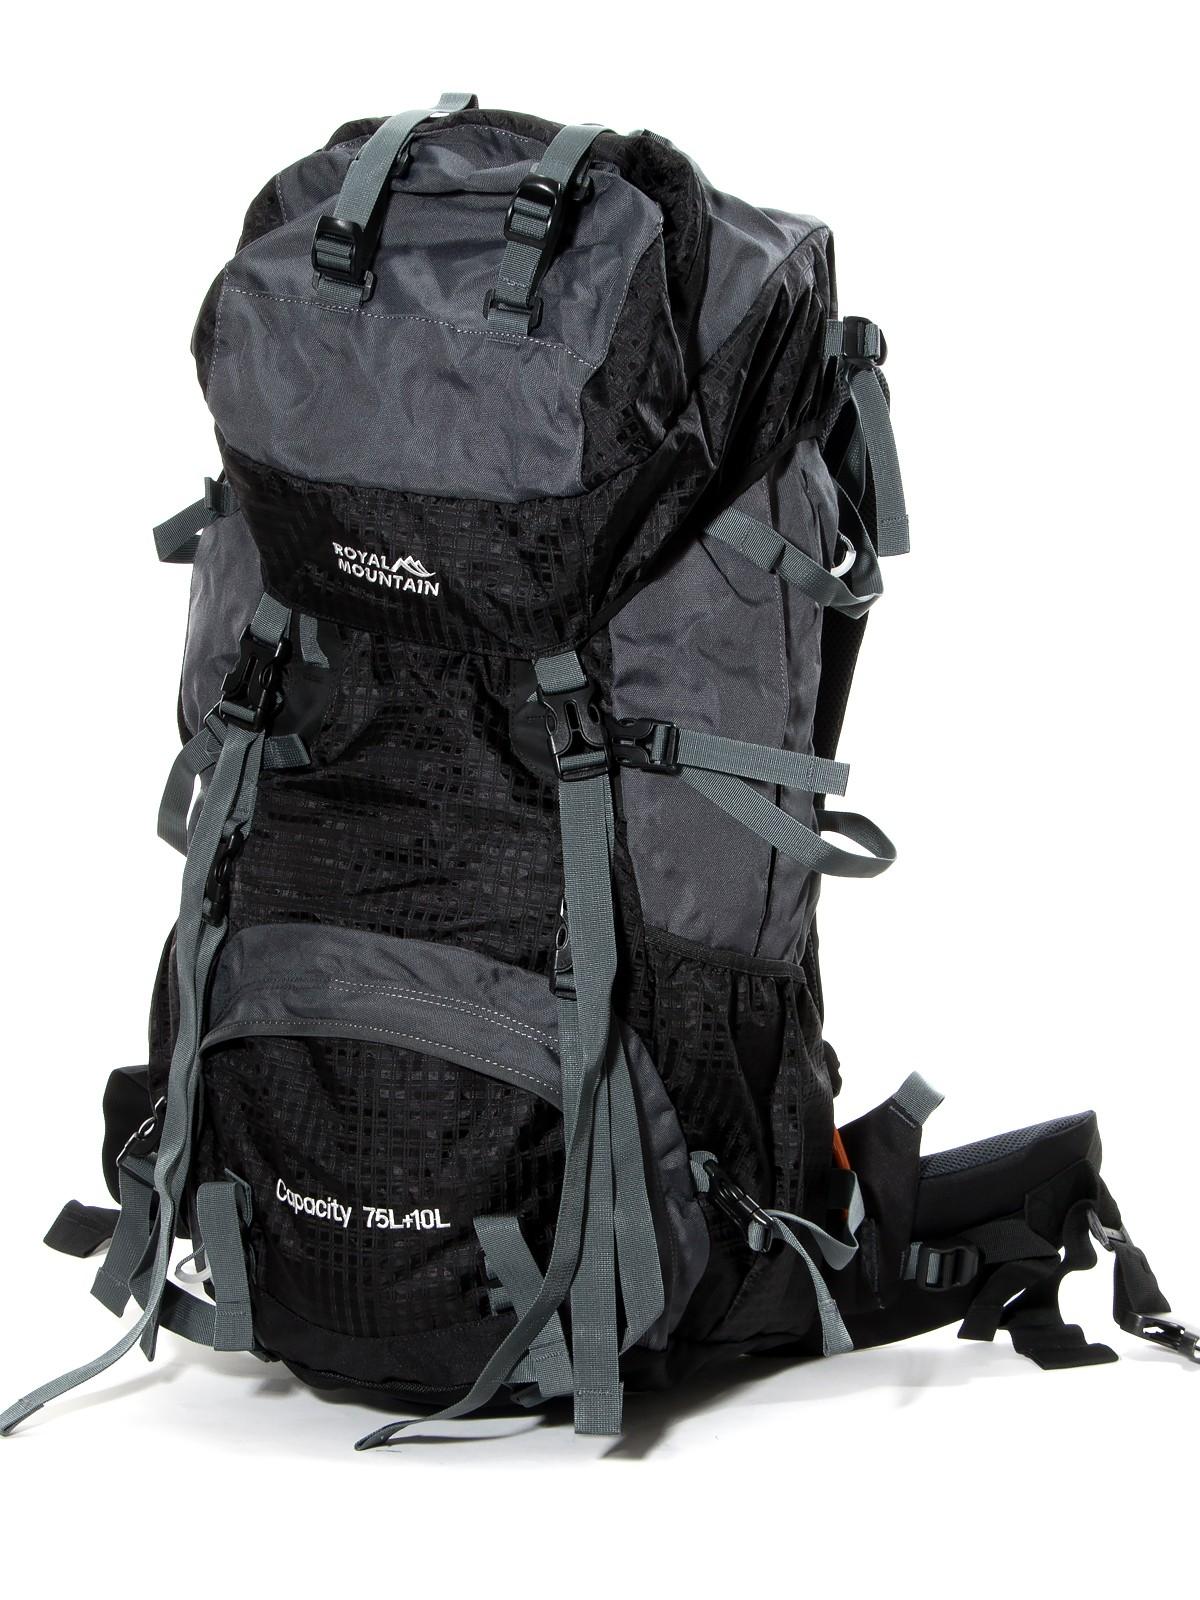 Рюкзак Туристический нейлон Royal Mountain 8330 black